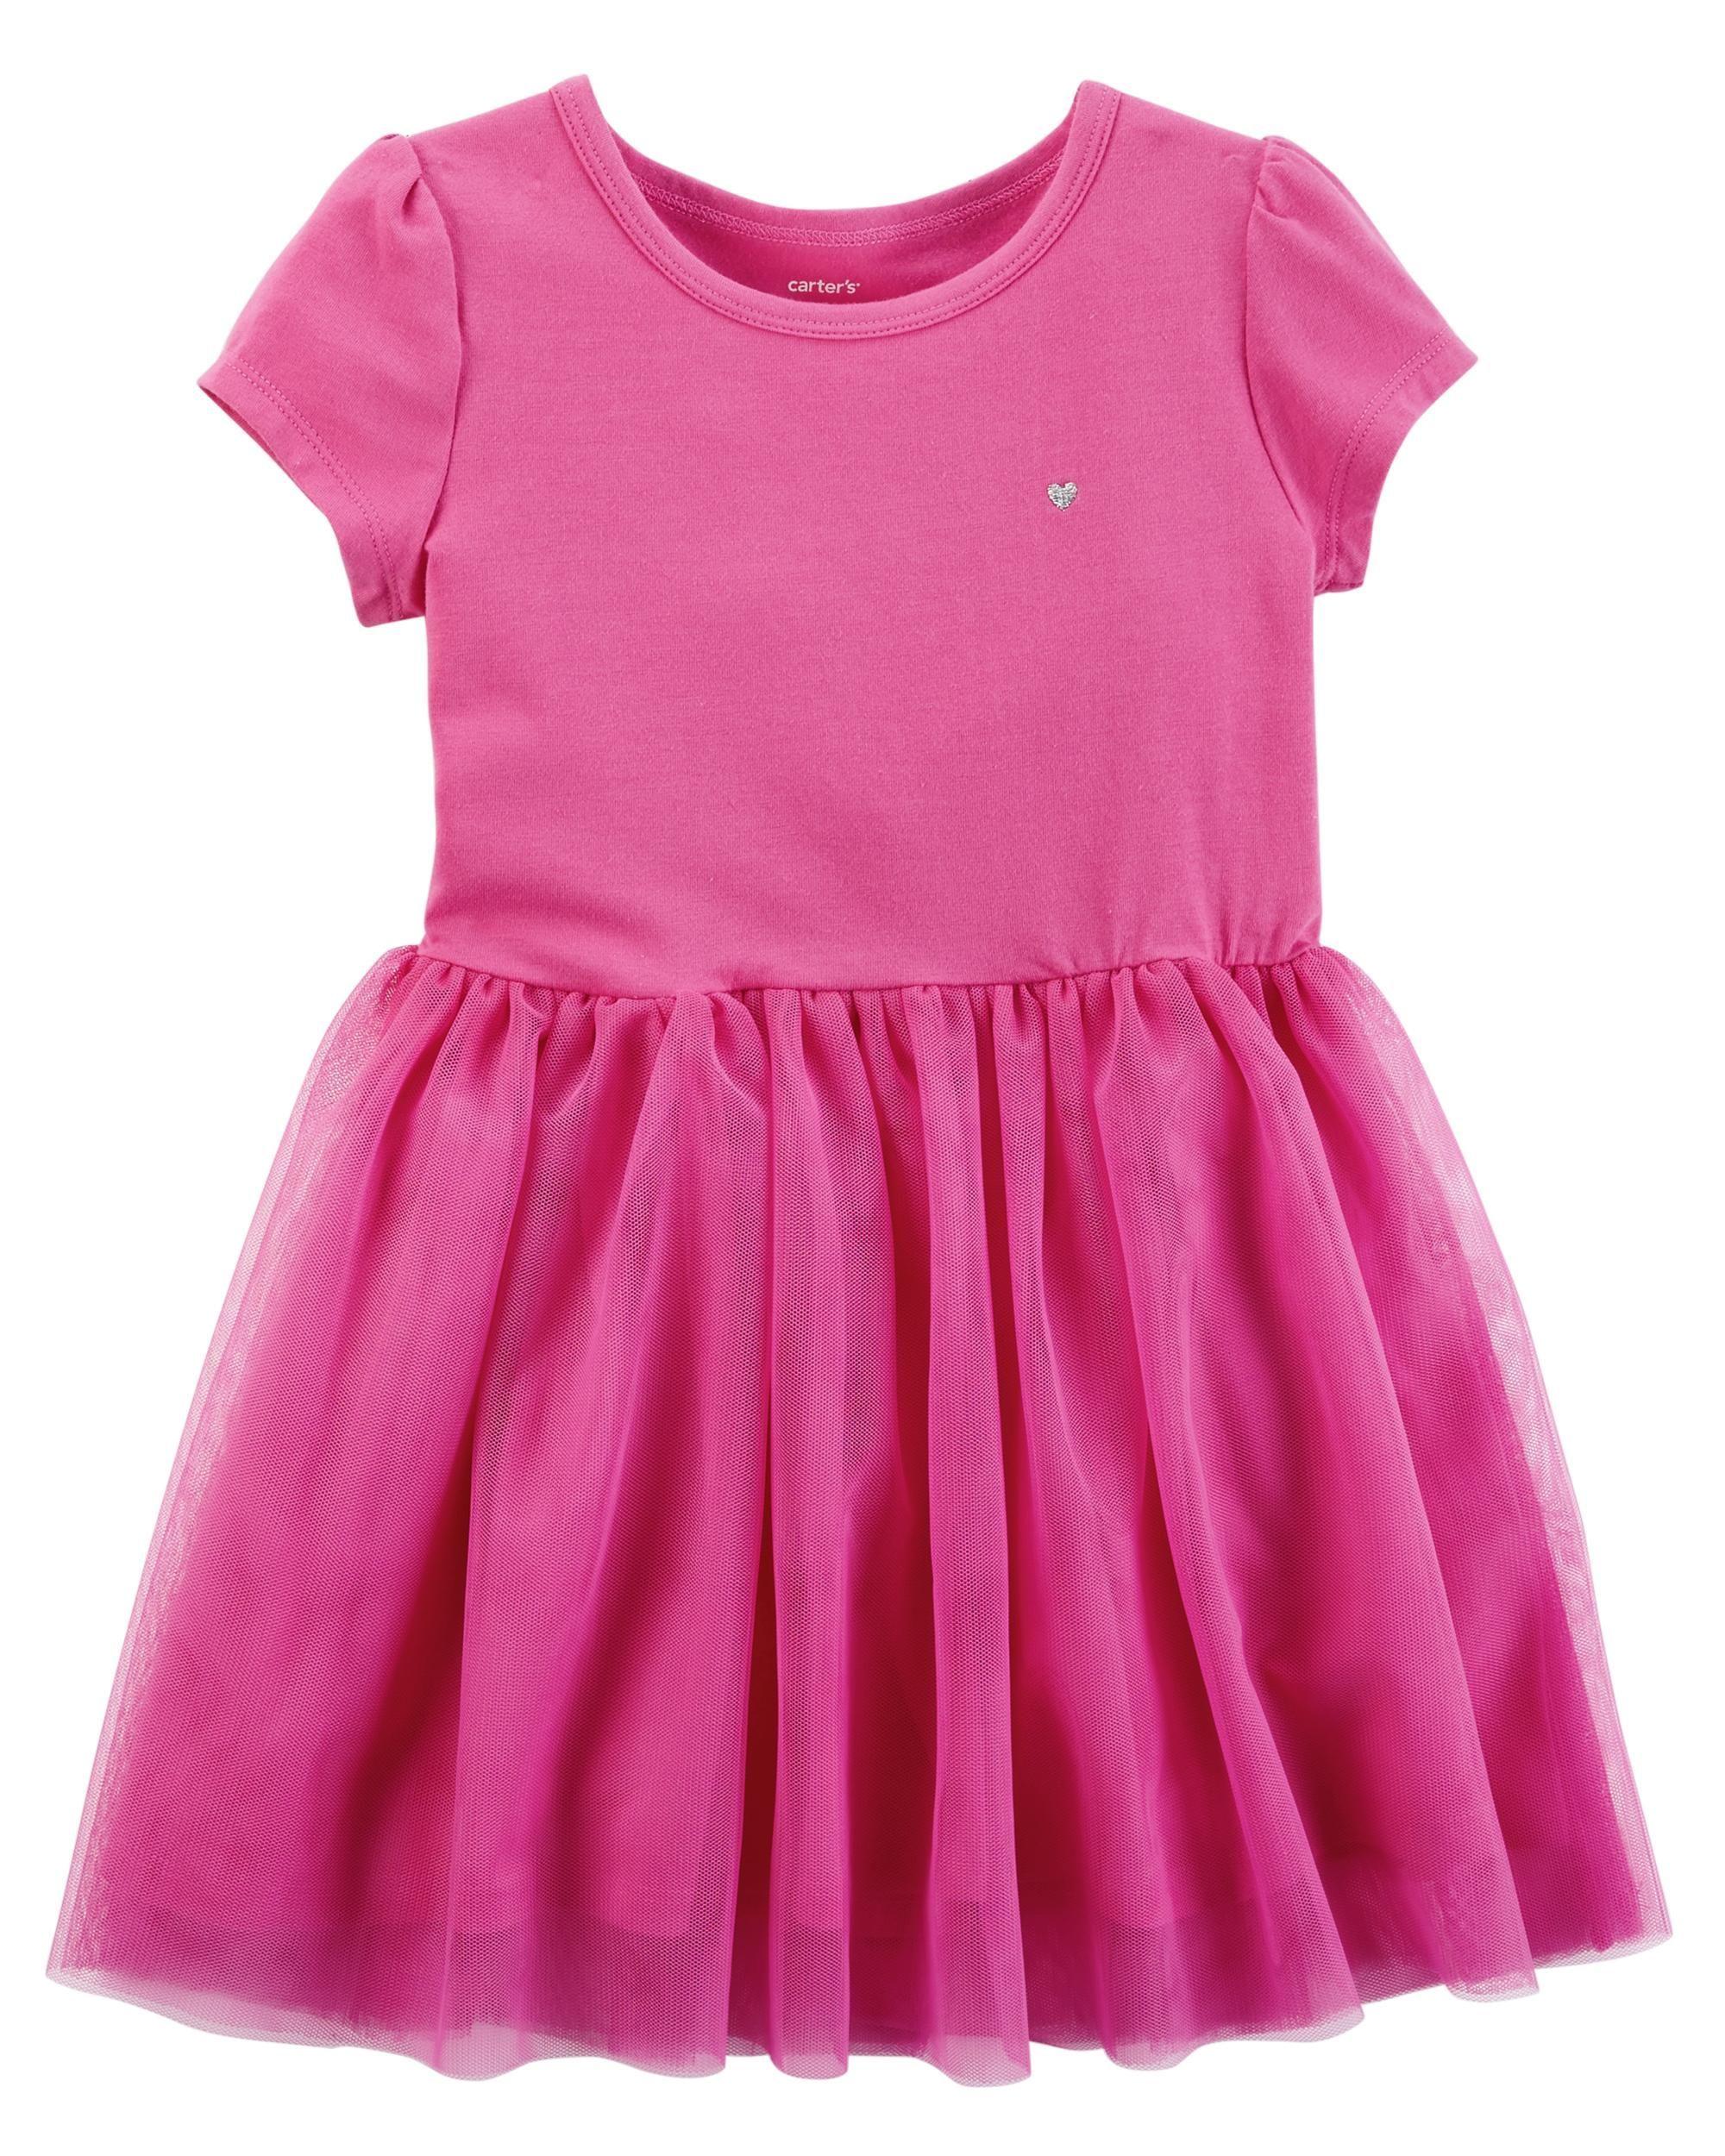 47d0fce568a8 Tutu Jersey Dress